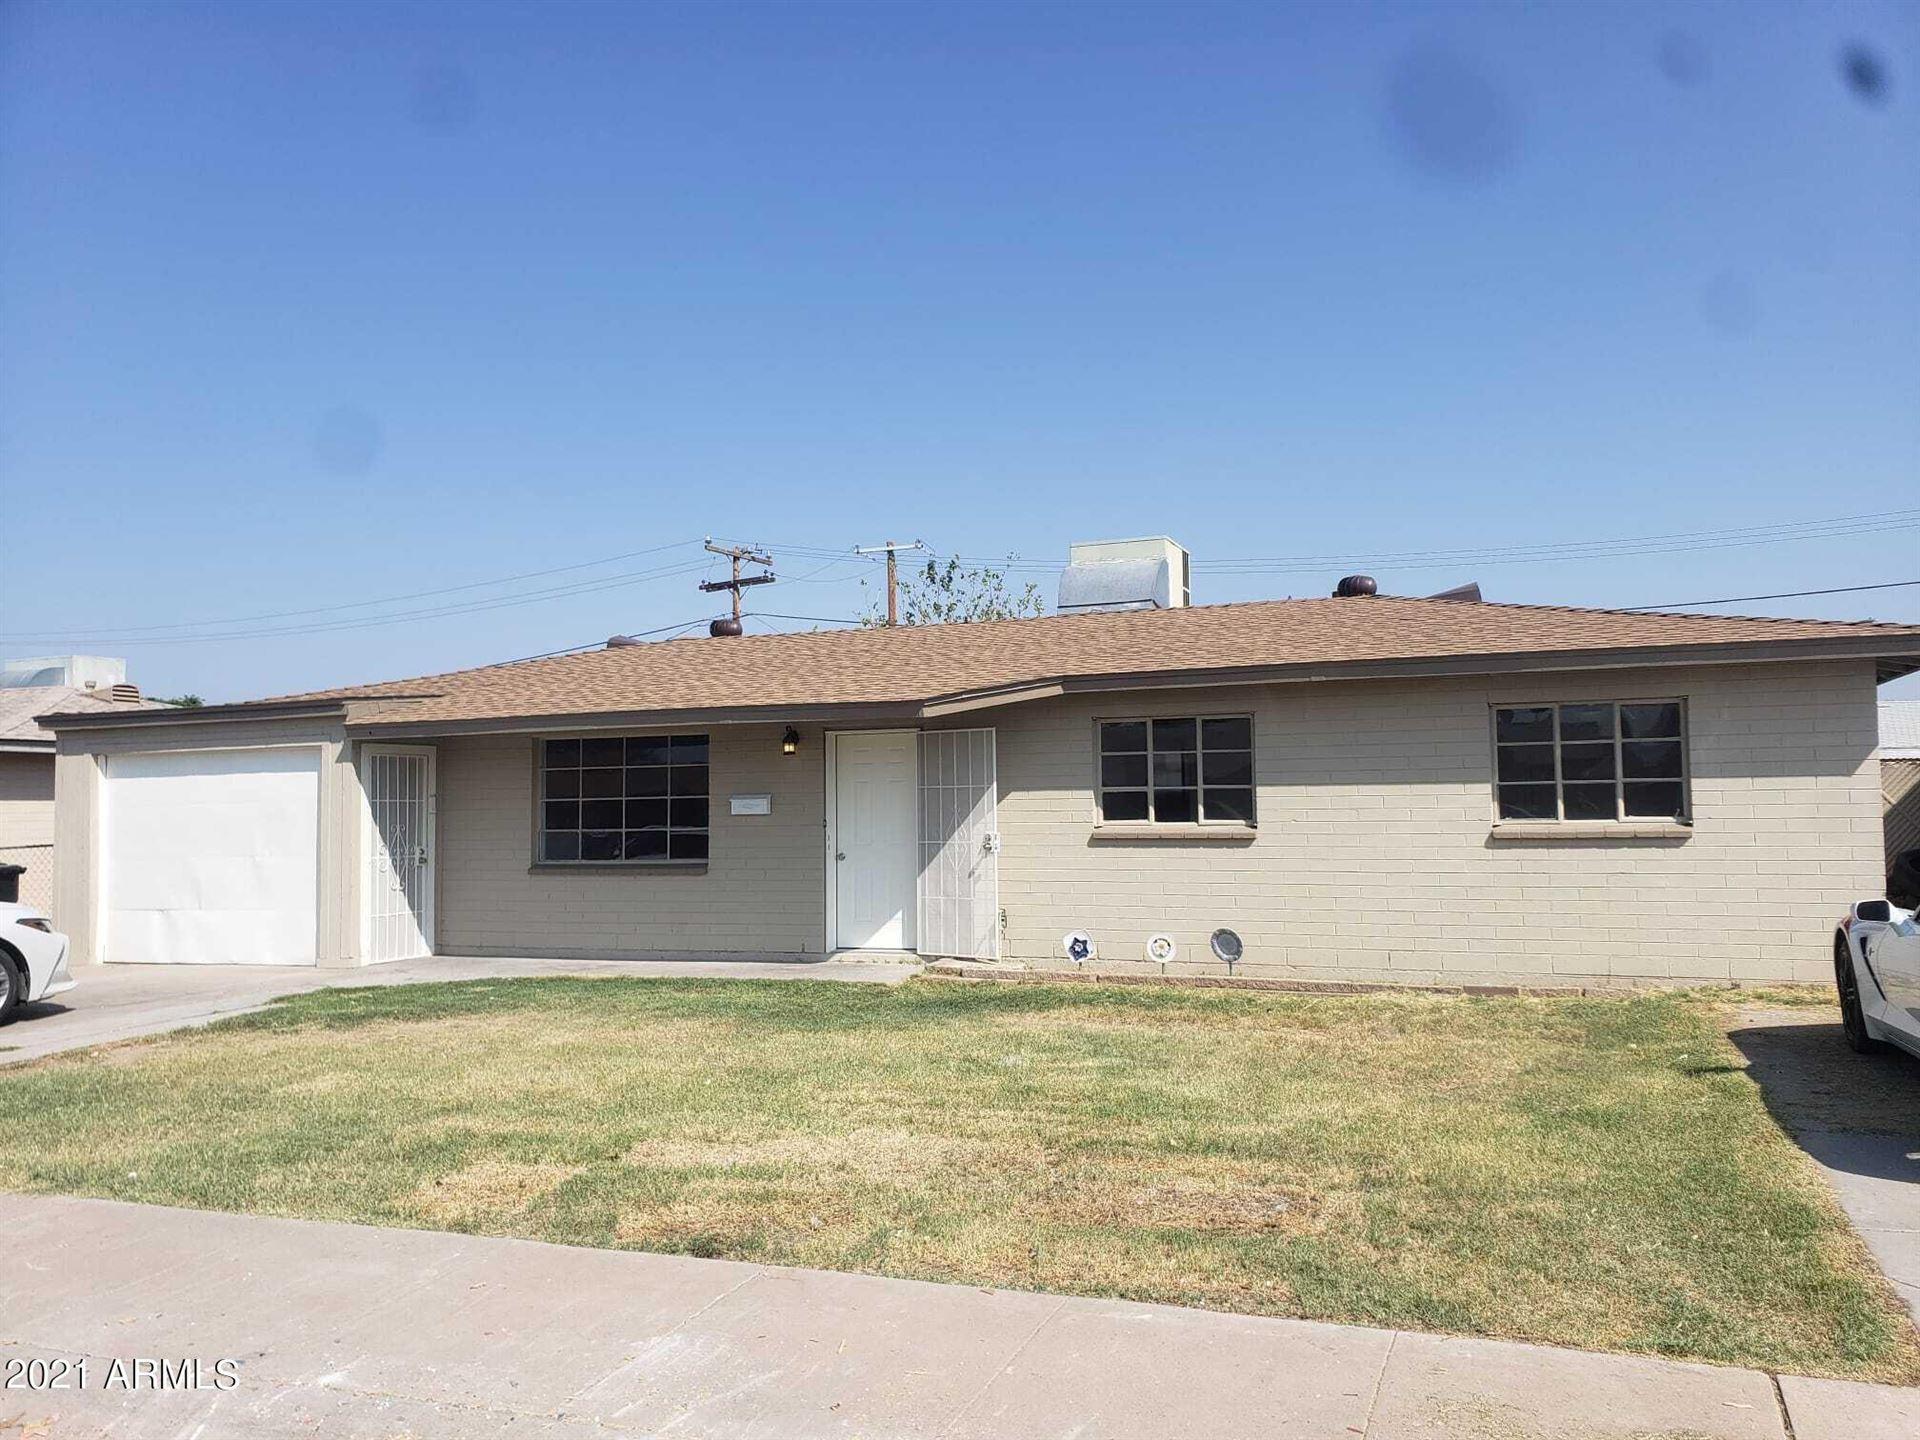 Photo of 206 W KINDERMAN Drive N, Avondale, AZ 85323 (MLS # 6294365)